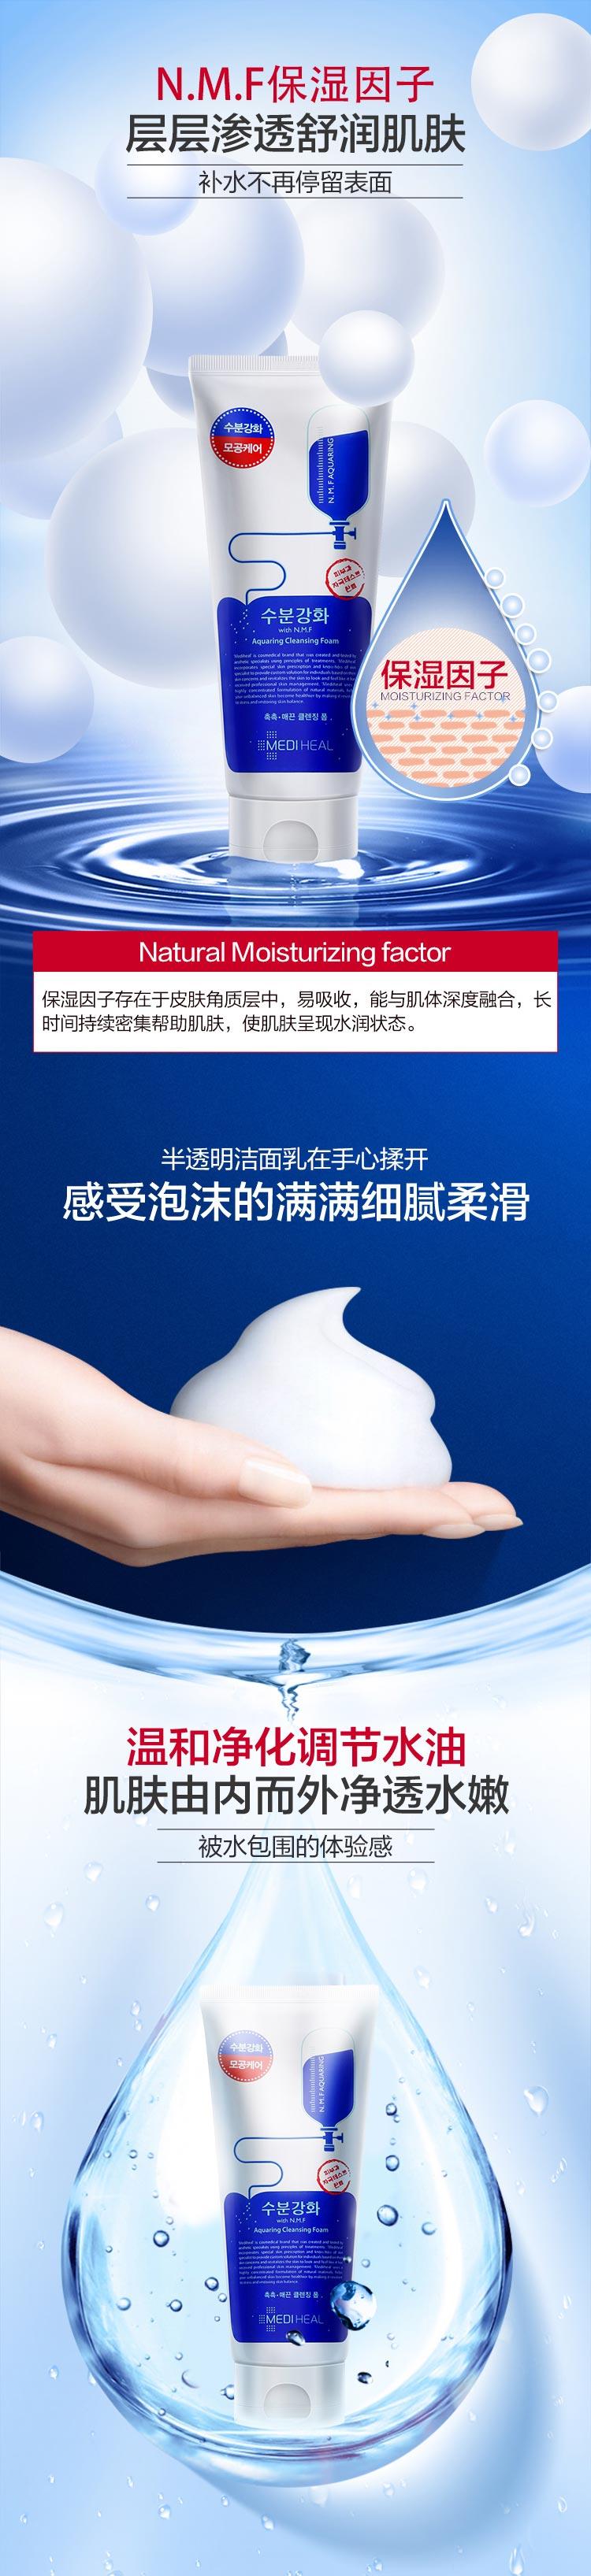 Mediheal Aquaring Cleansing Foam